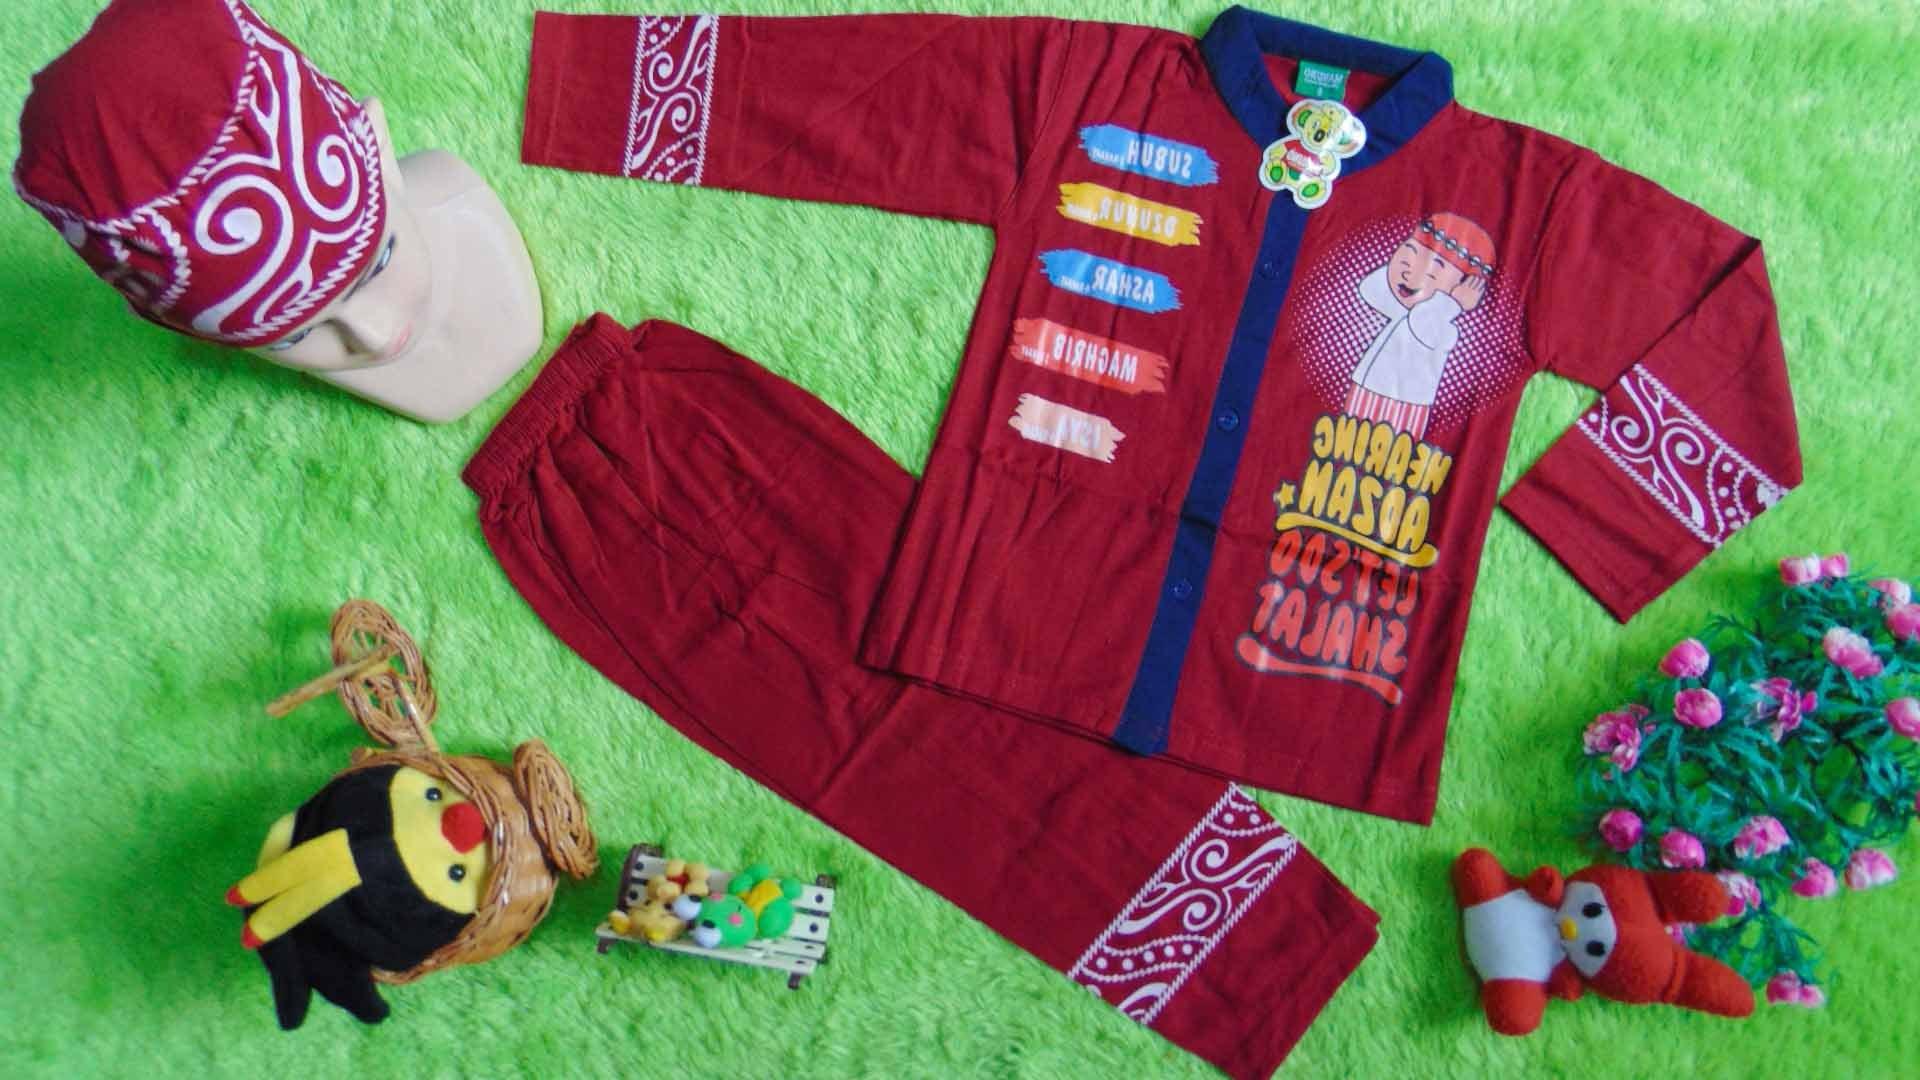 Ide Baju Lebaran Anak 2 Tahun Xtd6 Paling Laris Setelan Baju Koko Muslim Lebaran Ramadhan